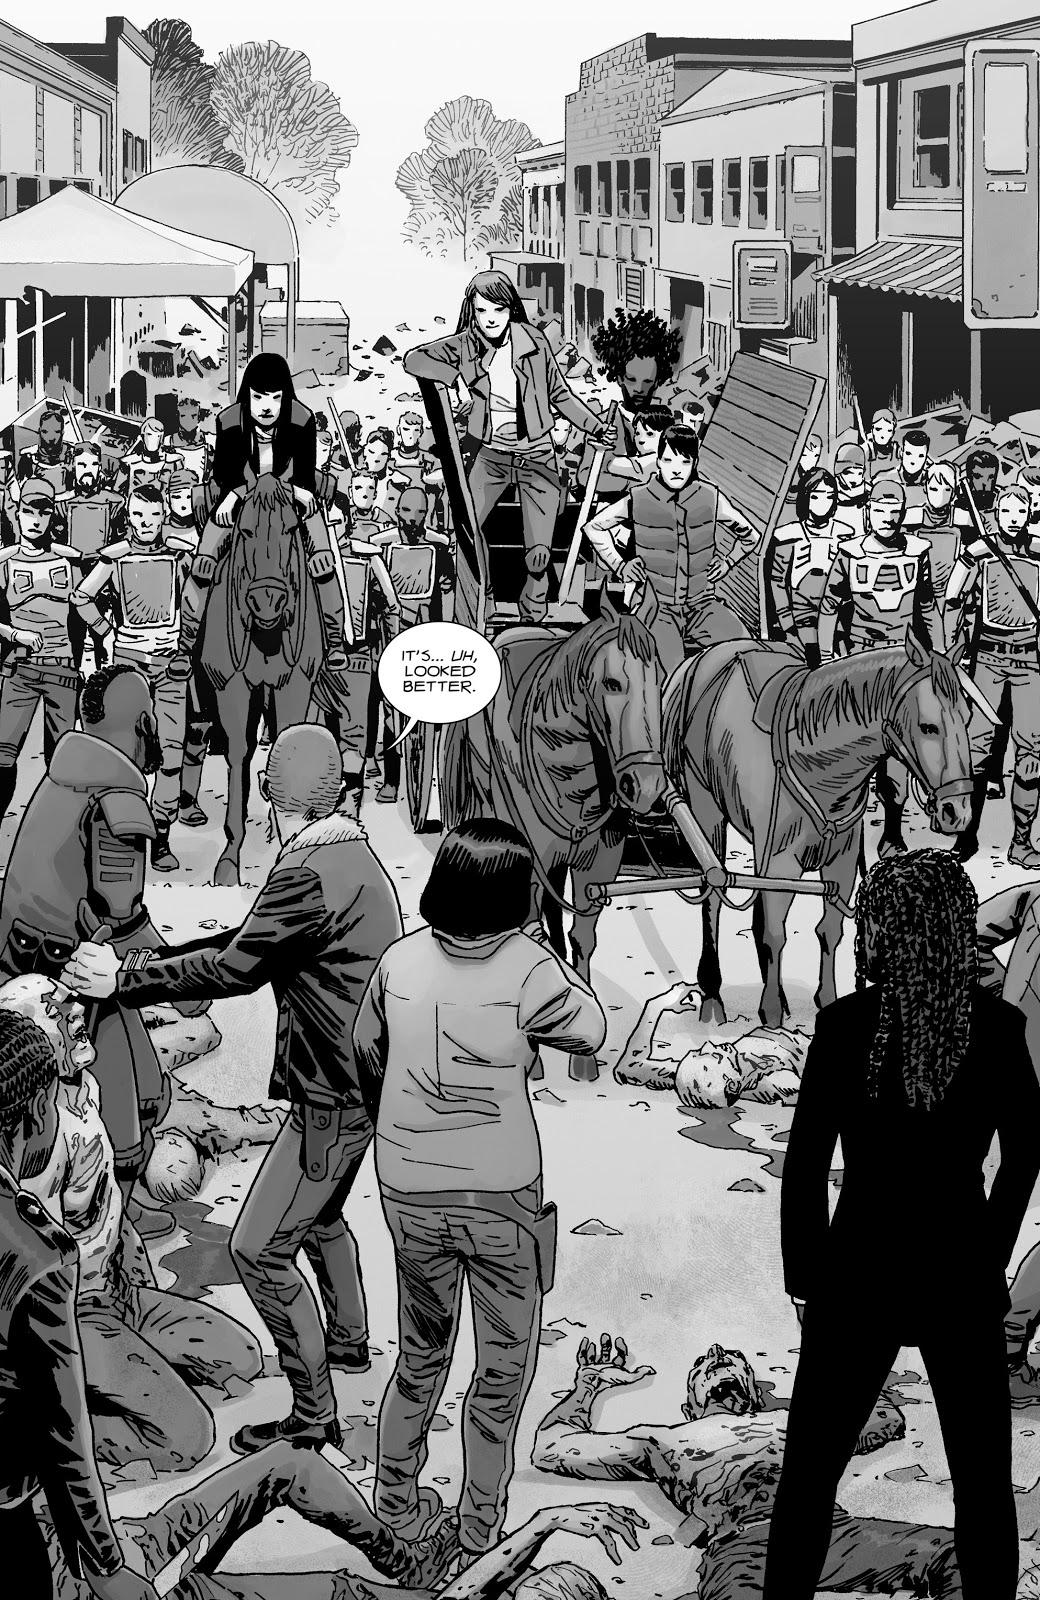 Governor Milton Declares War On Rick Grimes (The Walking Dead)